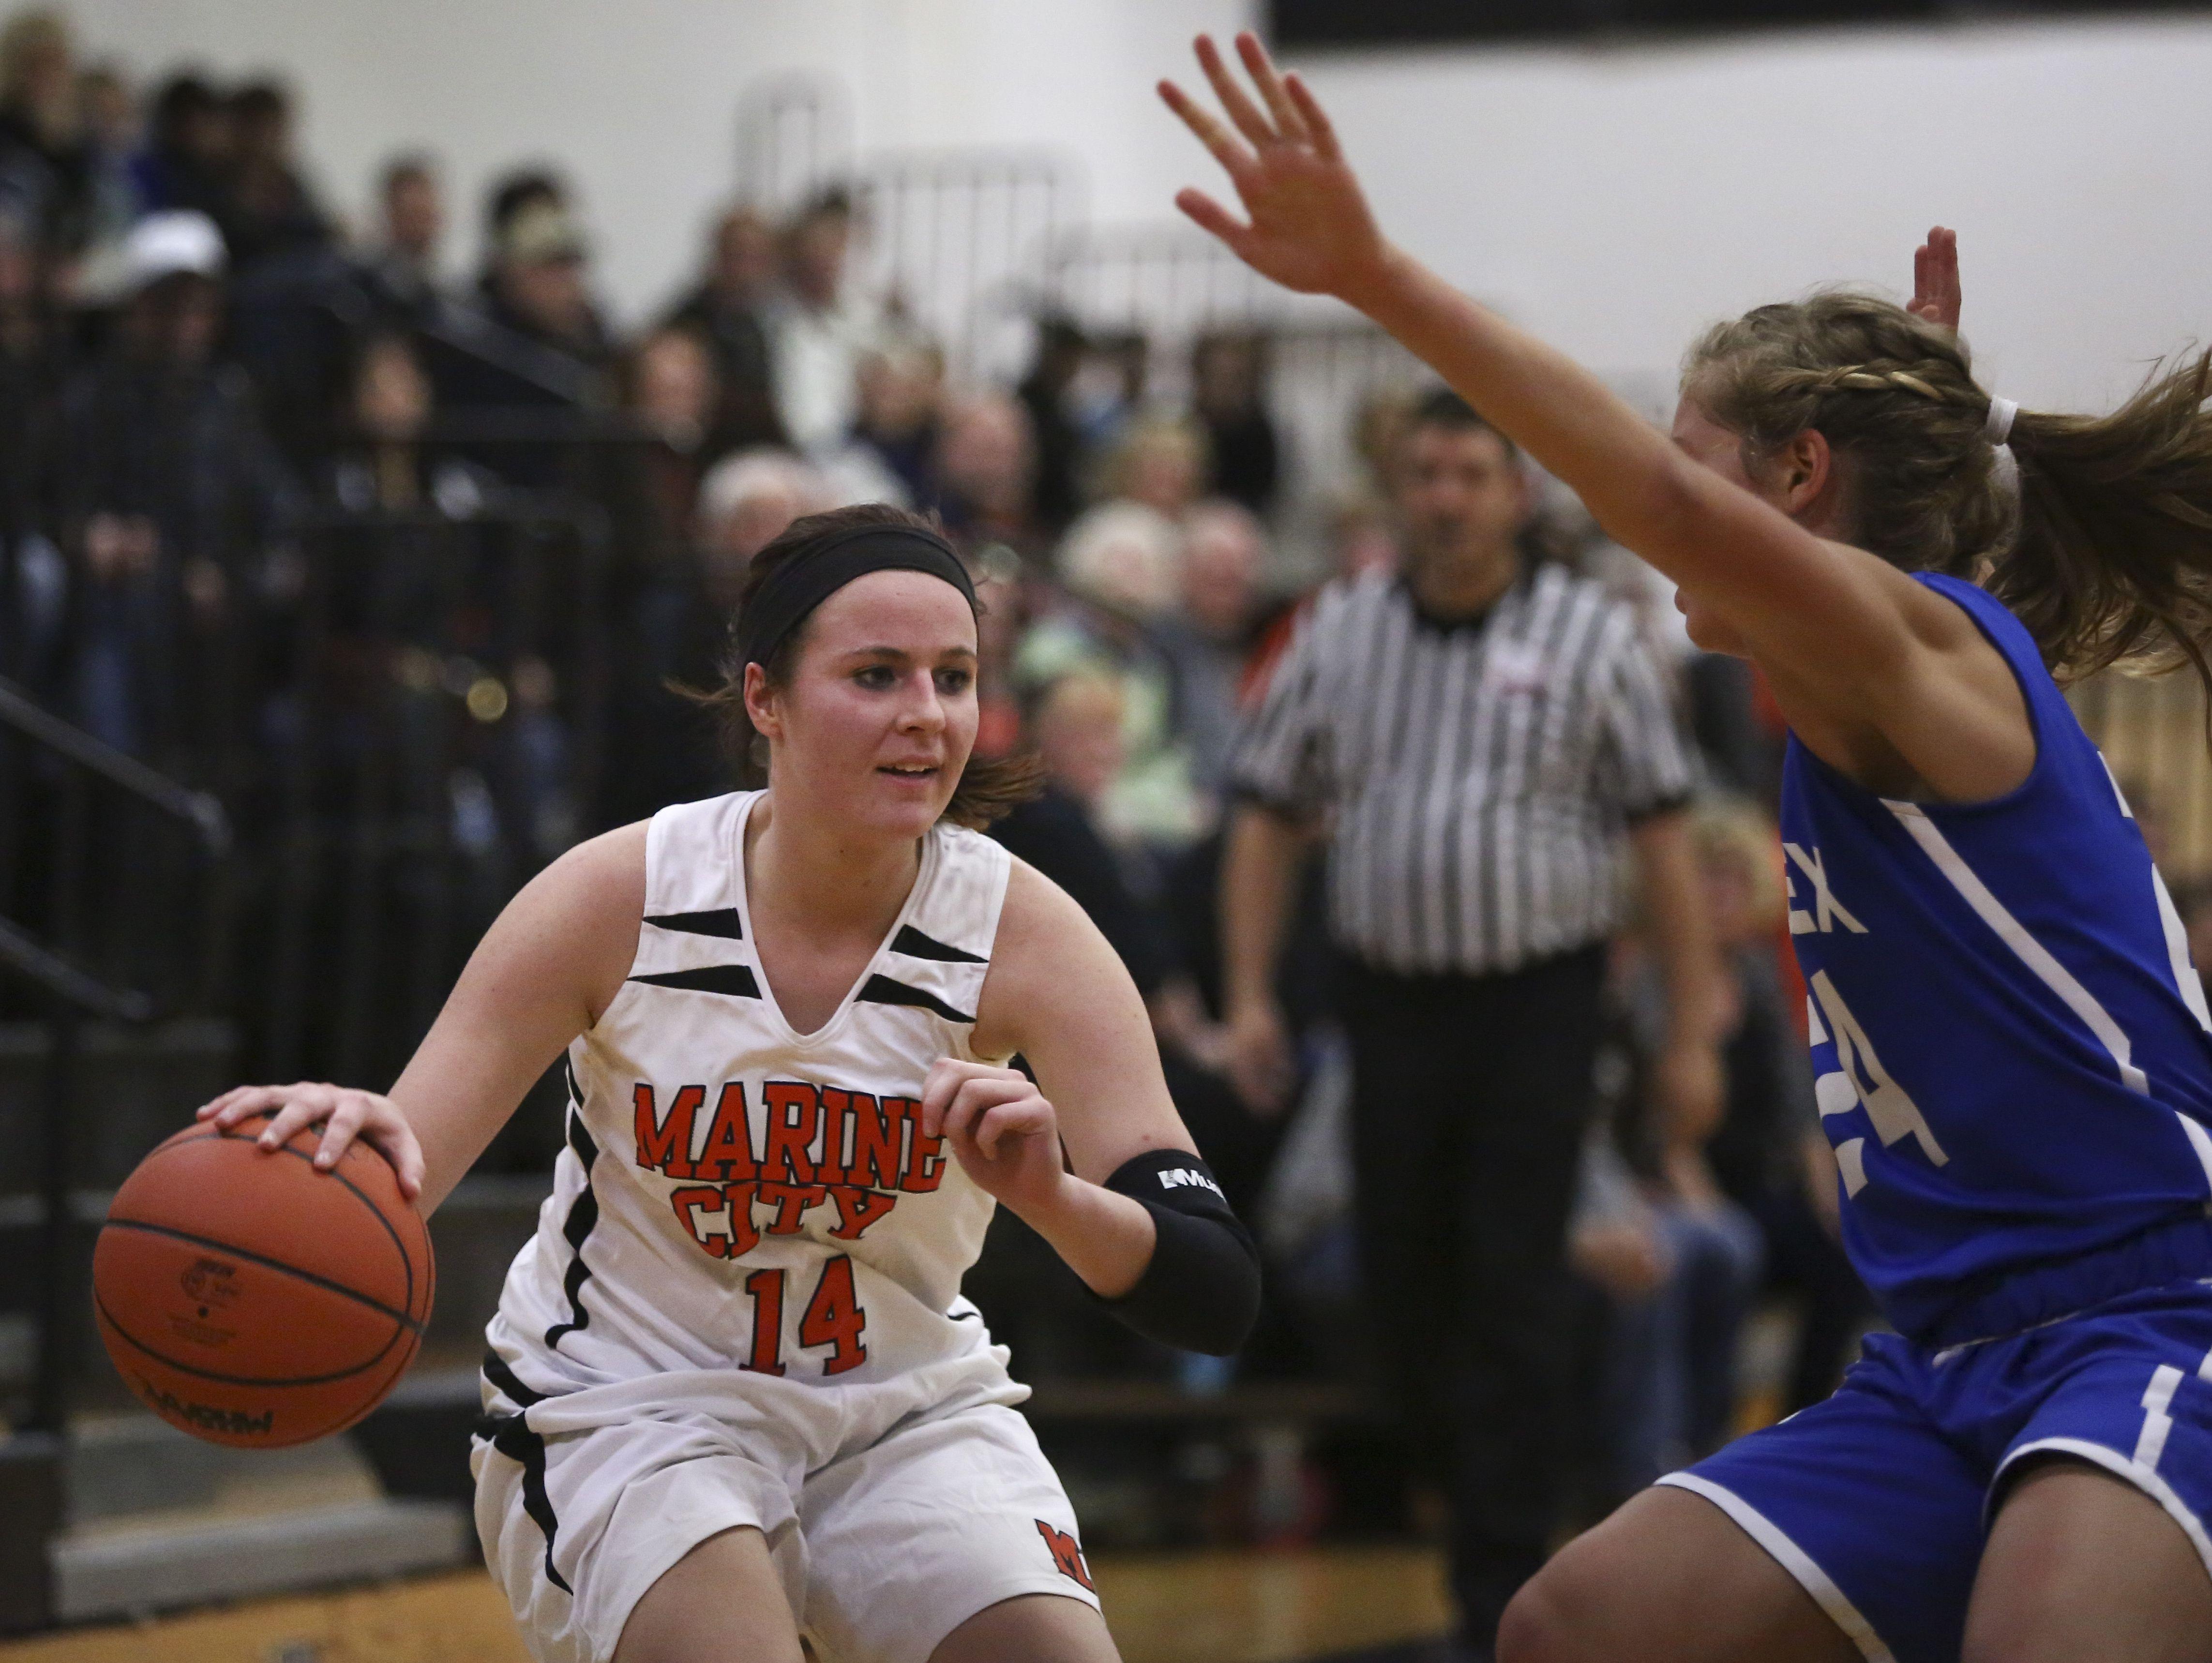 Marine City's Karyssa Austin drives the ball down court as Cros-Lex's Calli Townsend puts on pressure during a basketball game Tuesday, December 1, 2015 at Marine City High School.